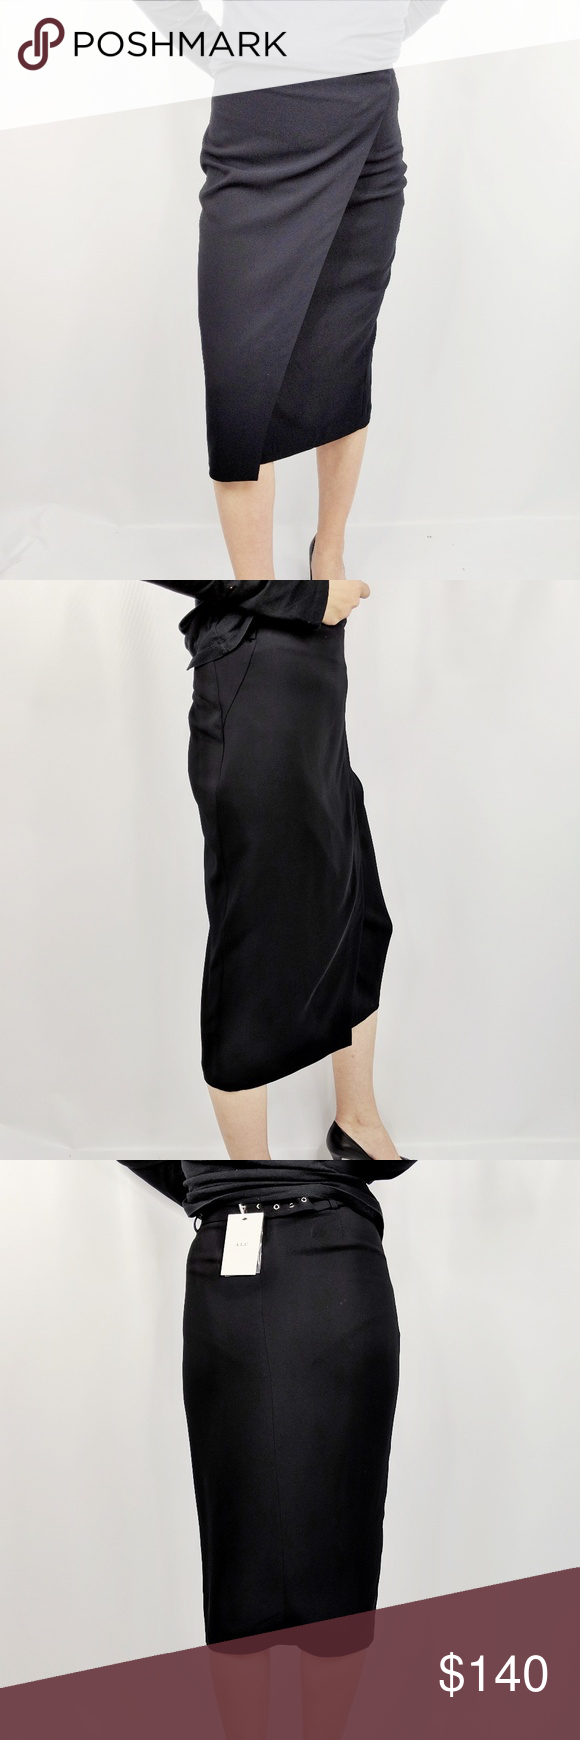 a257b59b2 NWT A.L.C. Daniels crepe midi wrap skirt black A.L.C. black crepe Daniels  pencil skirt styled with a partial belt. Belt loops at back, silvertone  hardware ...